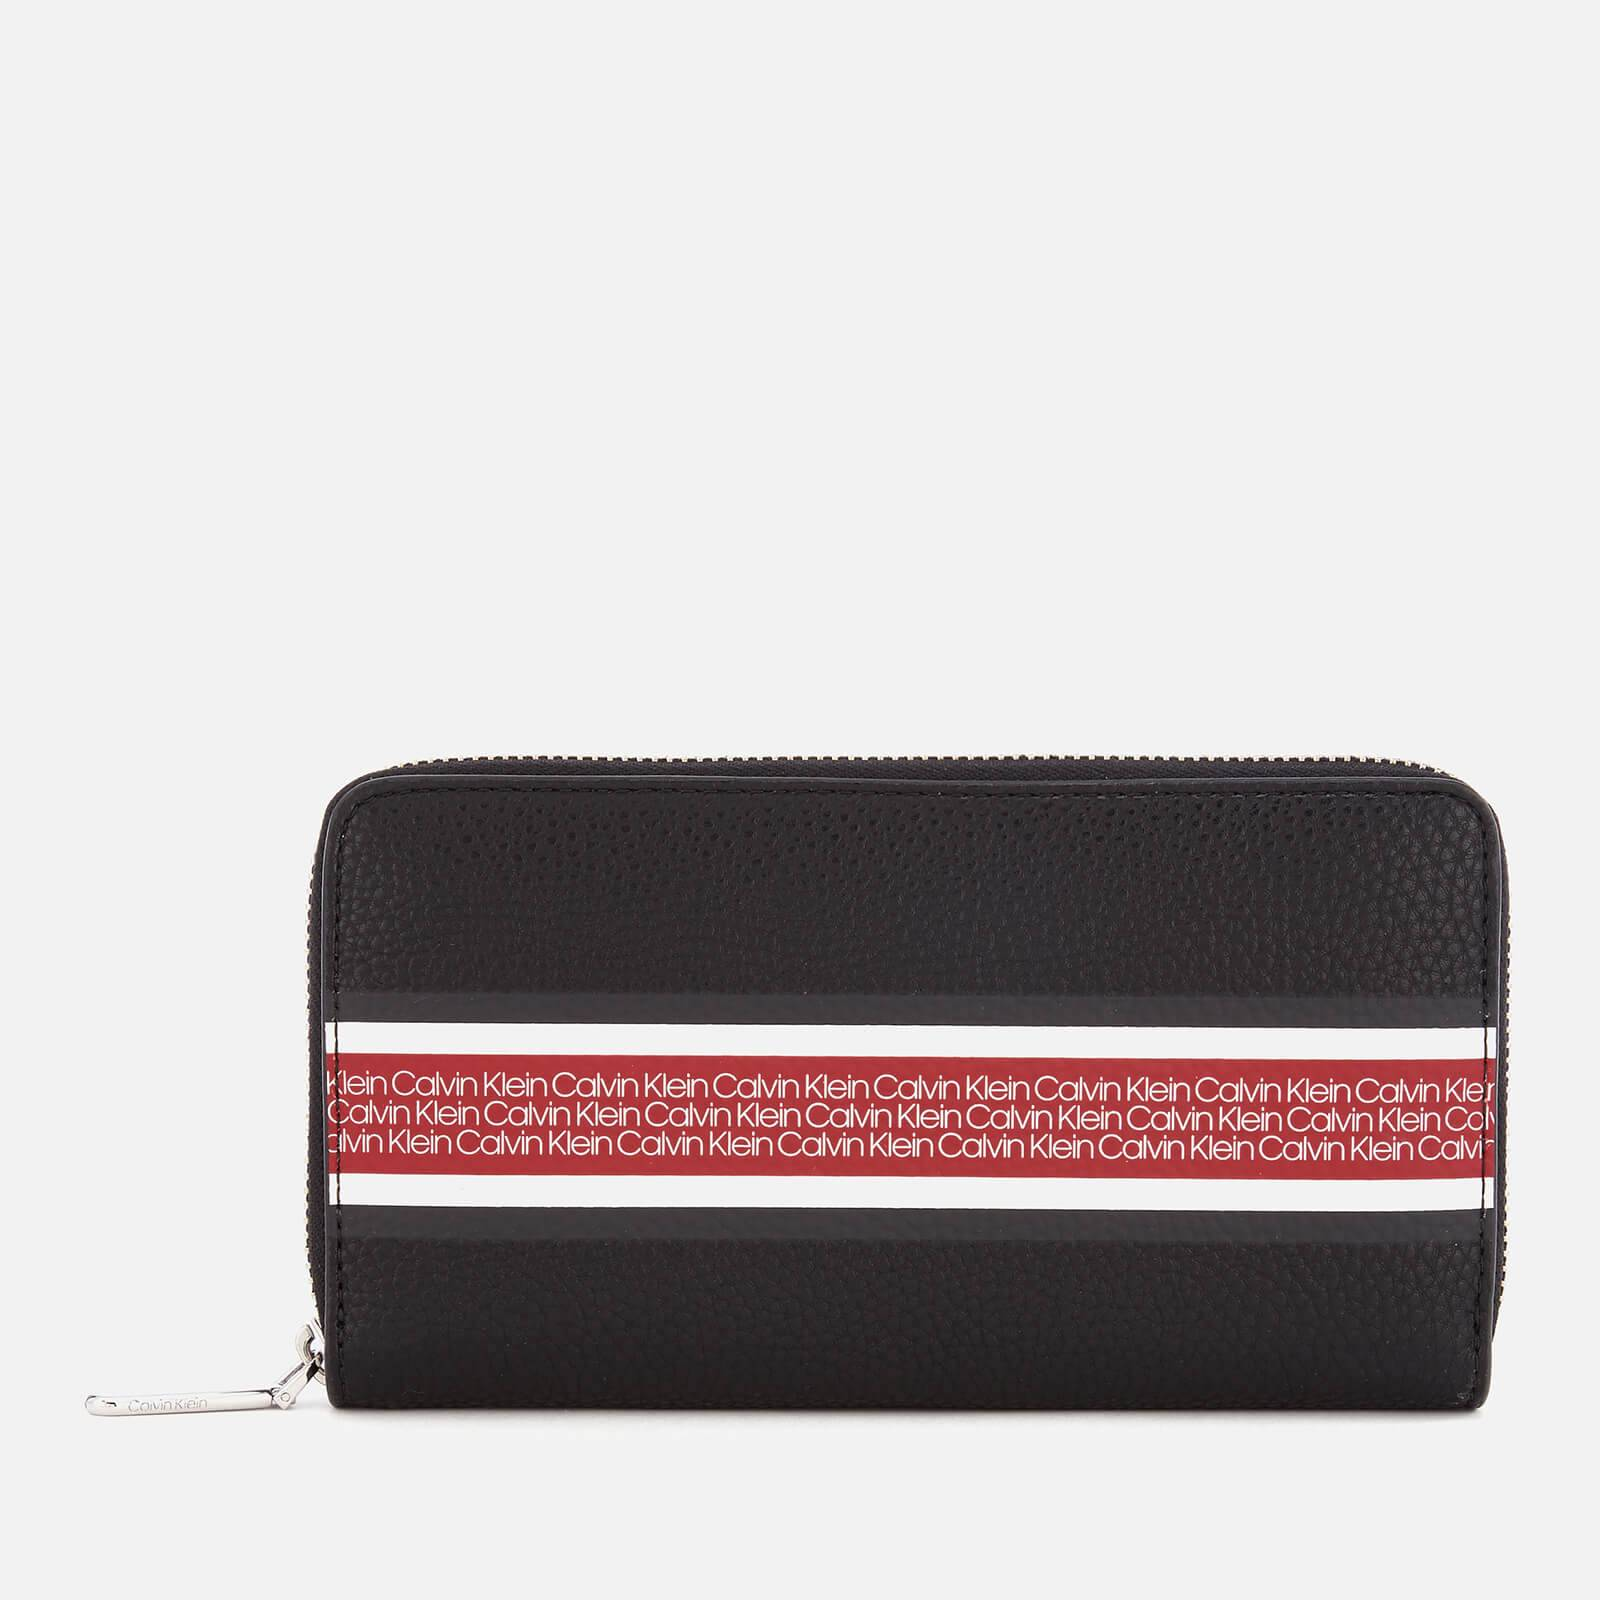 Calvin Klein Women's Race Large Zip Around Wallet - Black